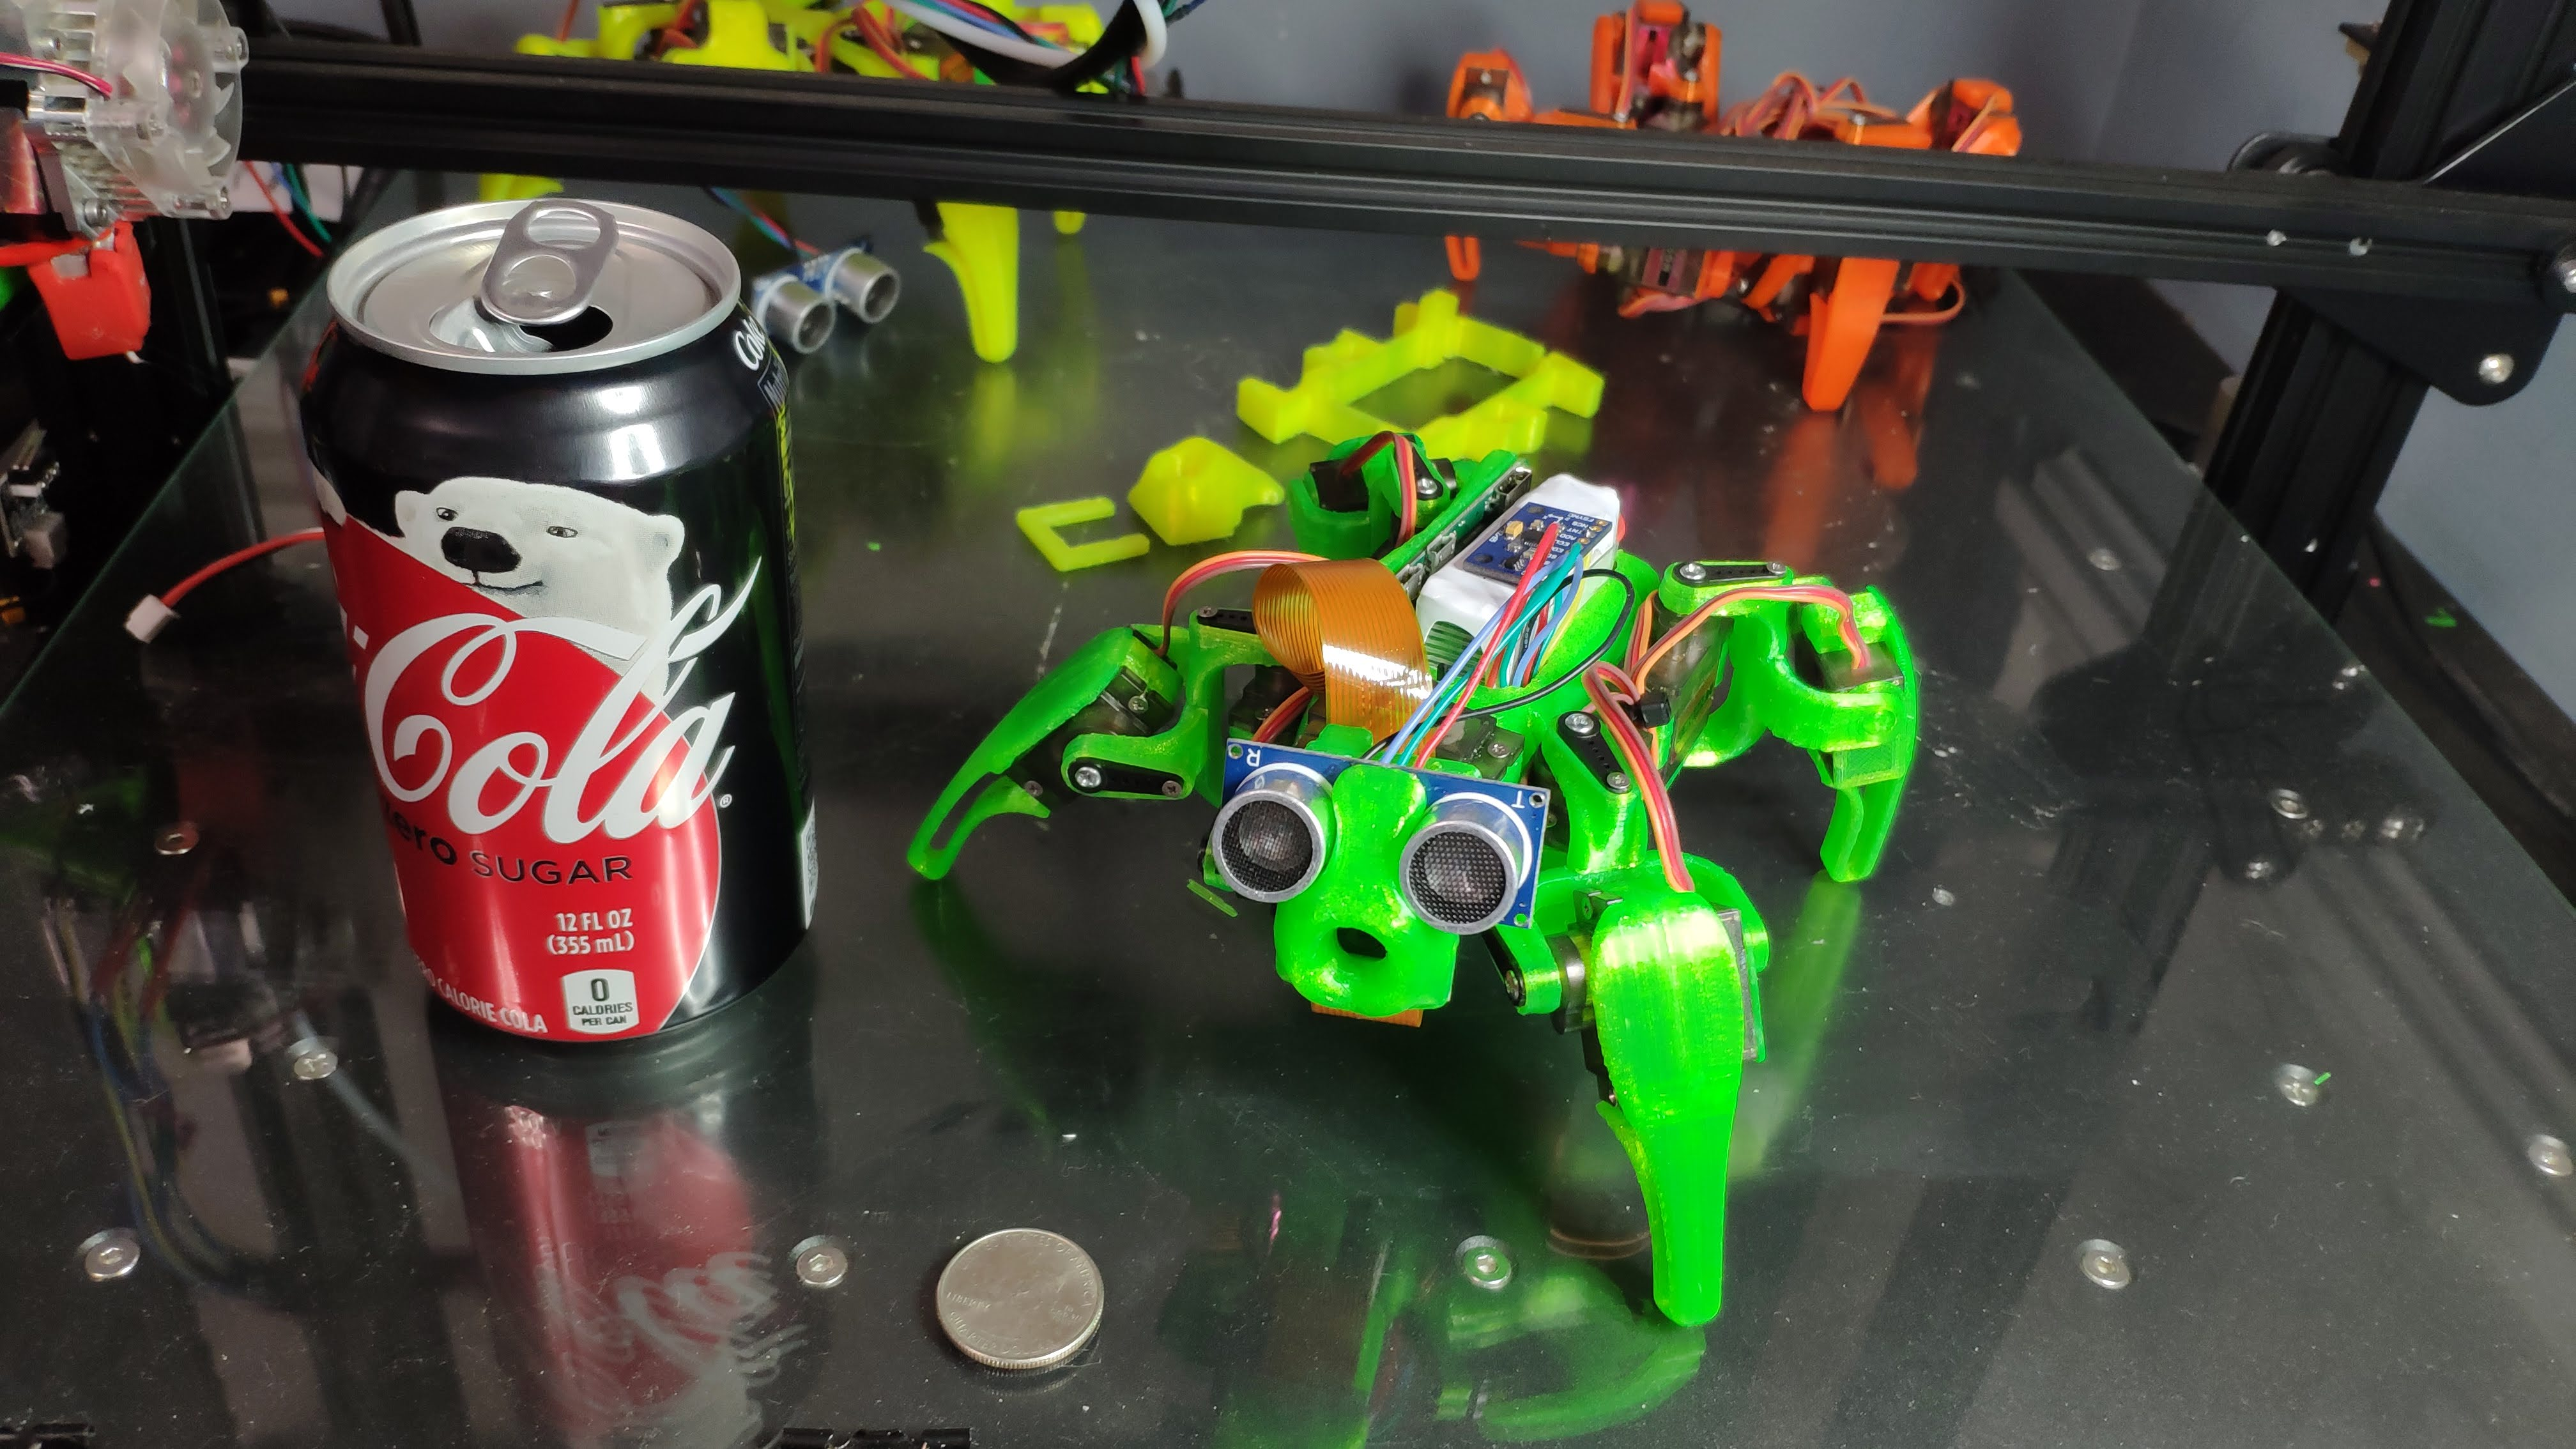 Todd the Quad四足玩具机器人3D打印图纸 Fusion 360 IGS STL格式